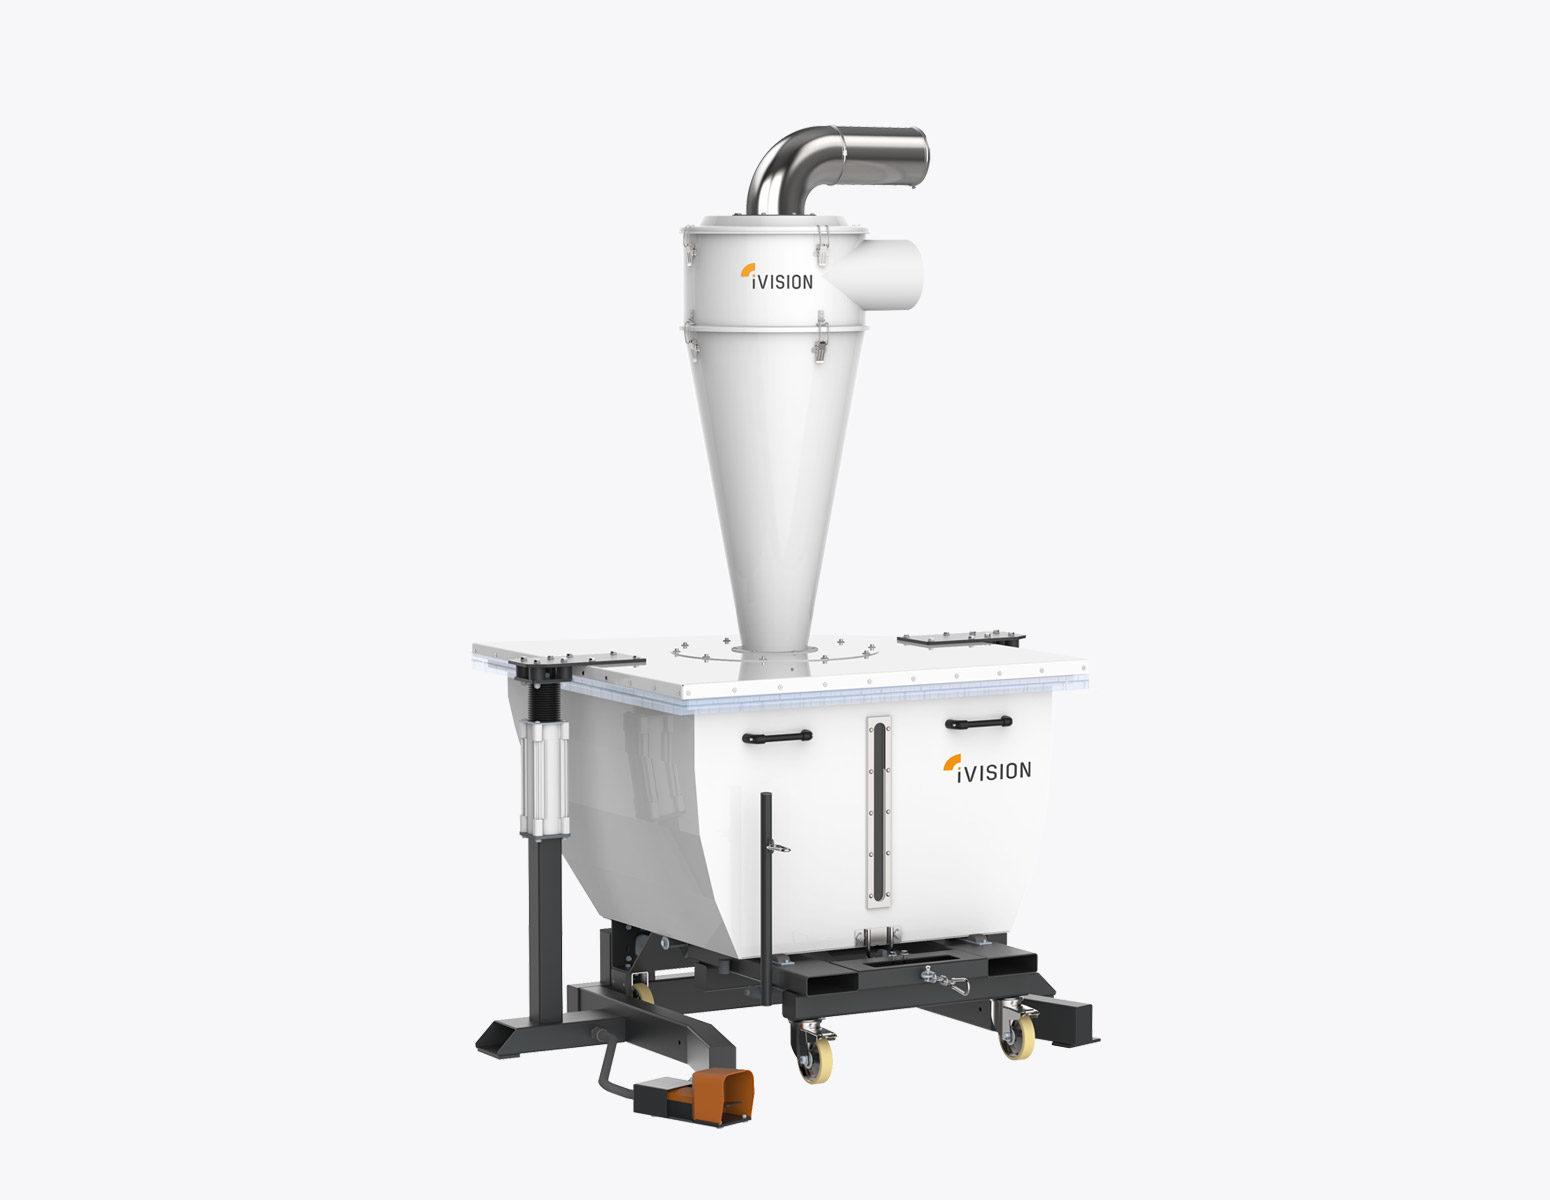 cyclonic-prefilter-industrial-vacuum-cleaners-ivision-vacuum-1000l